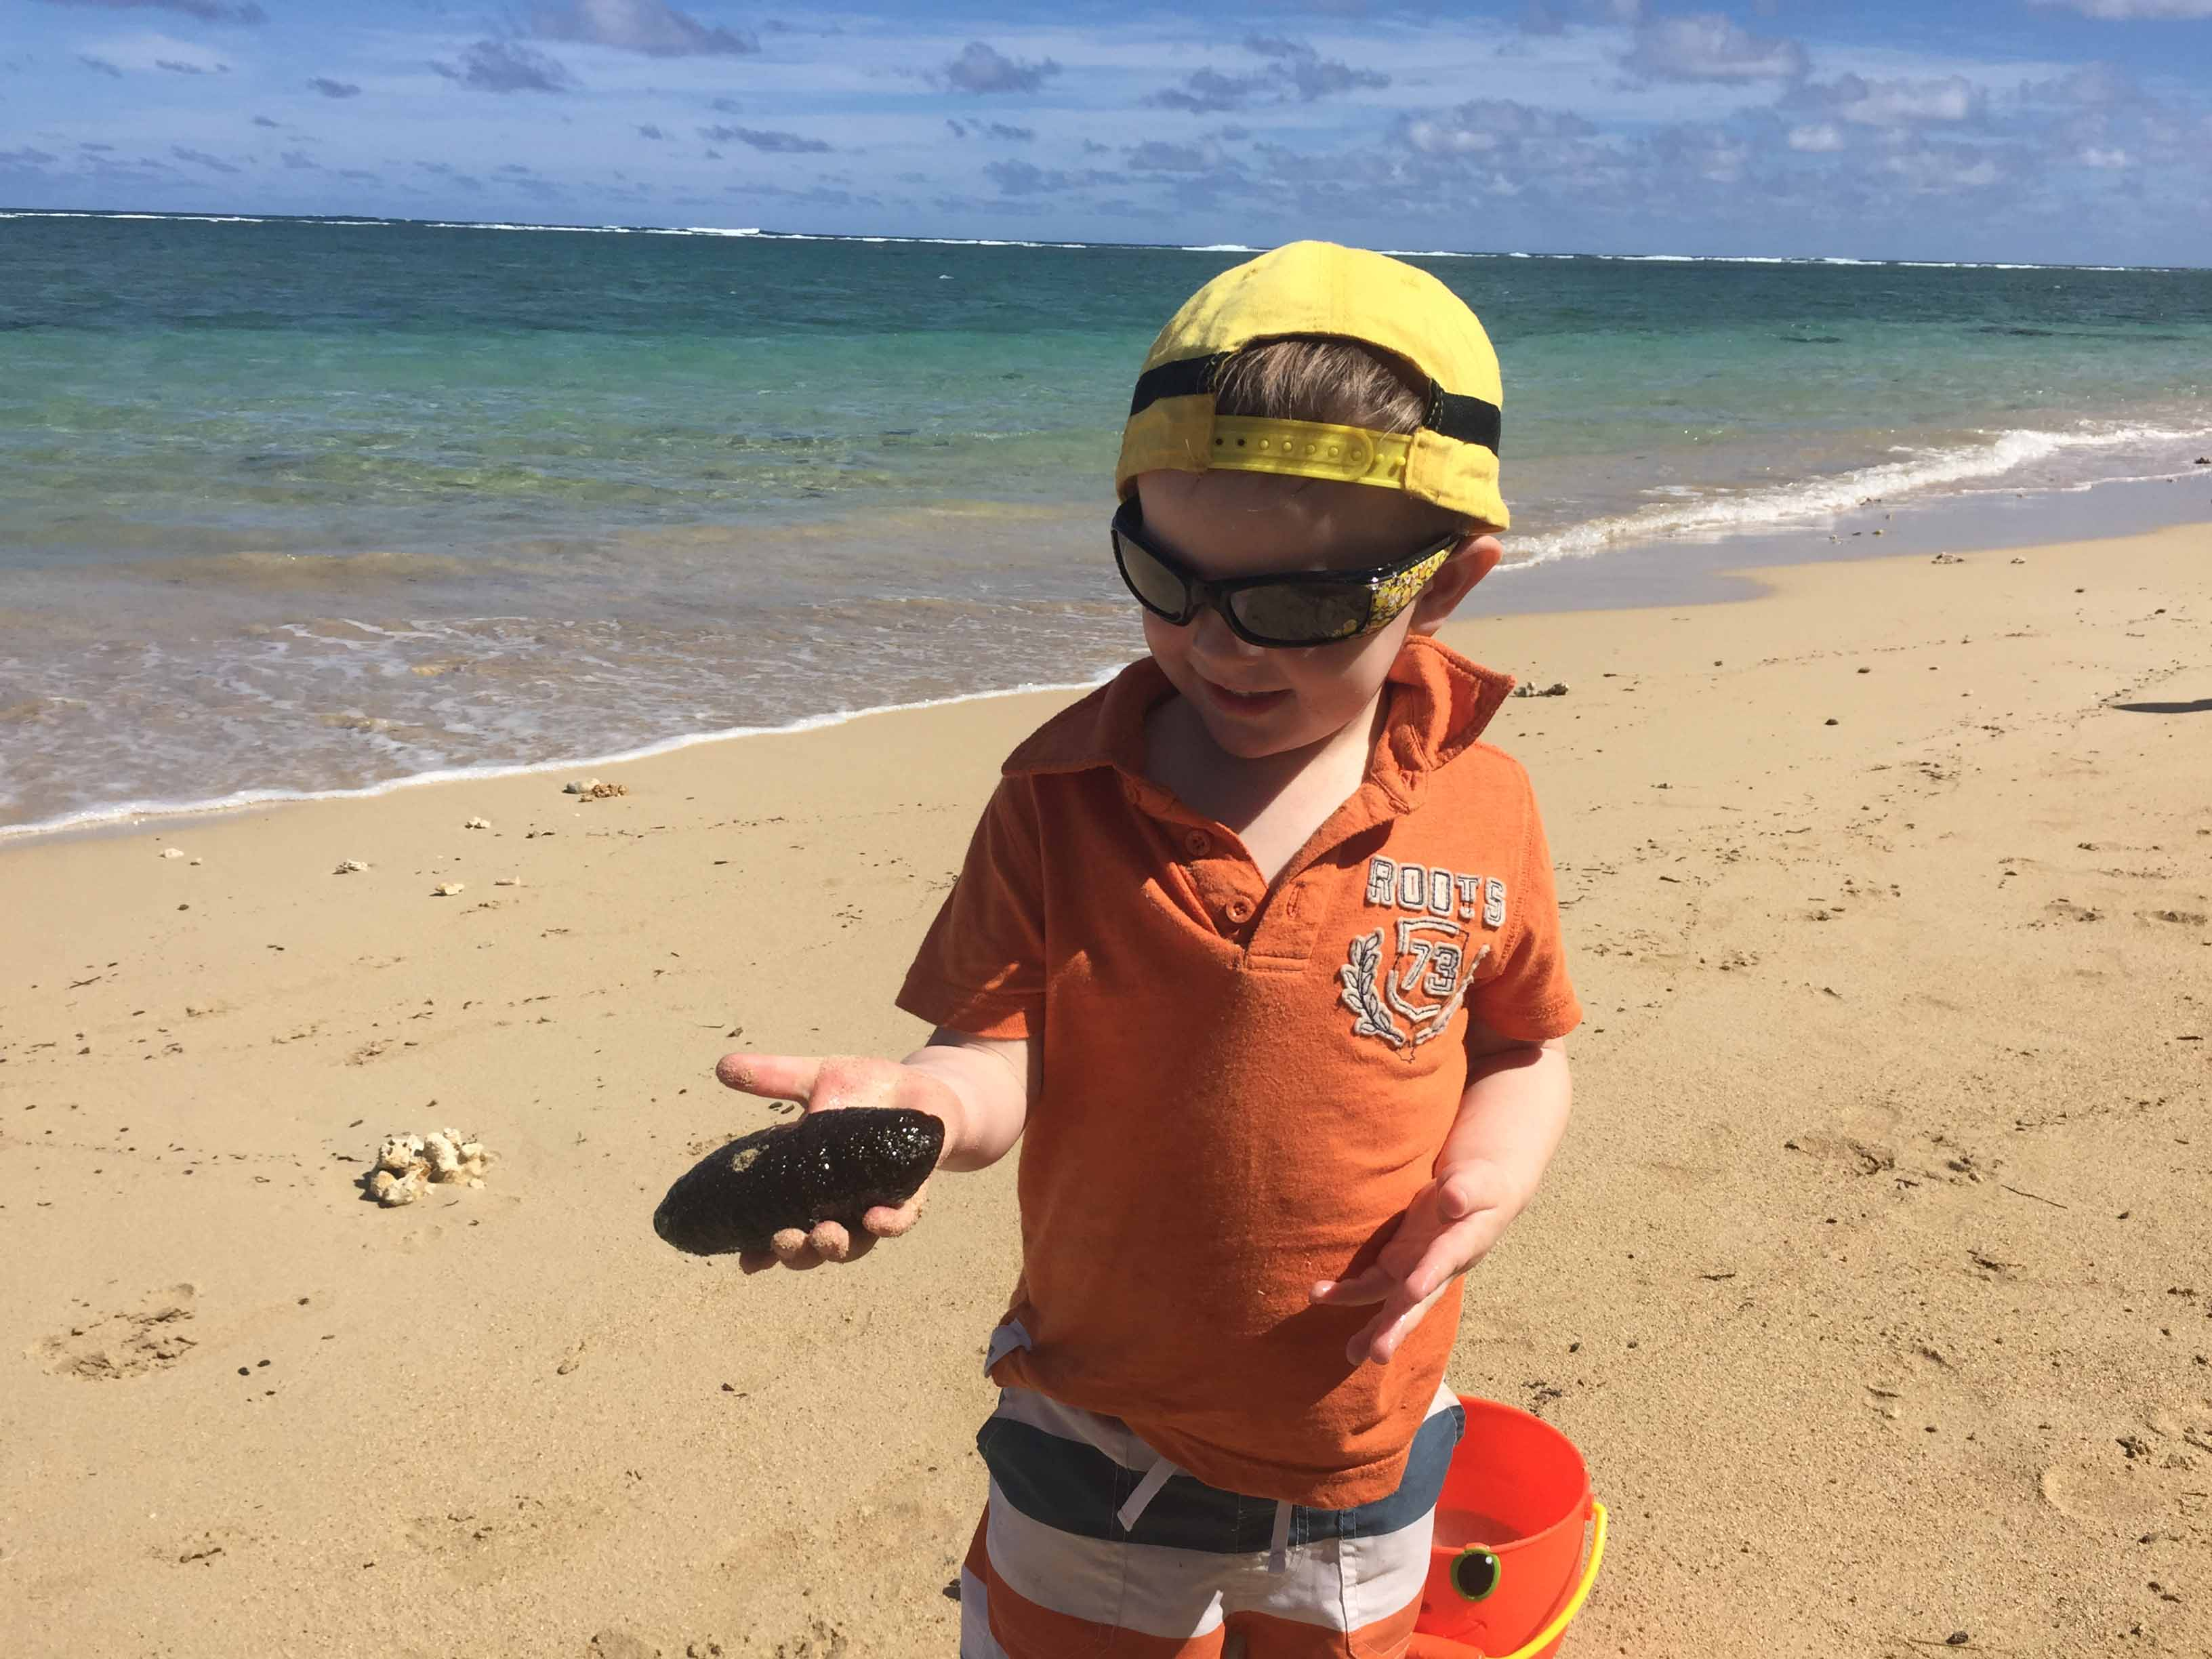 Found a Sea Cucumber in the tide pools